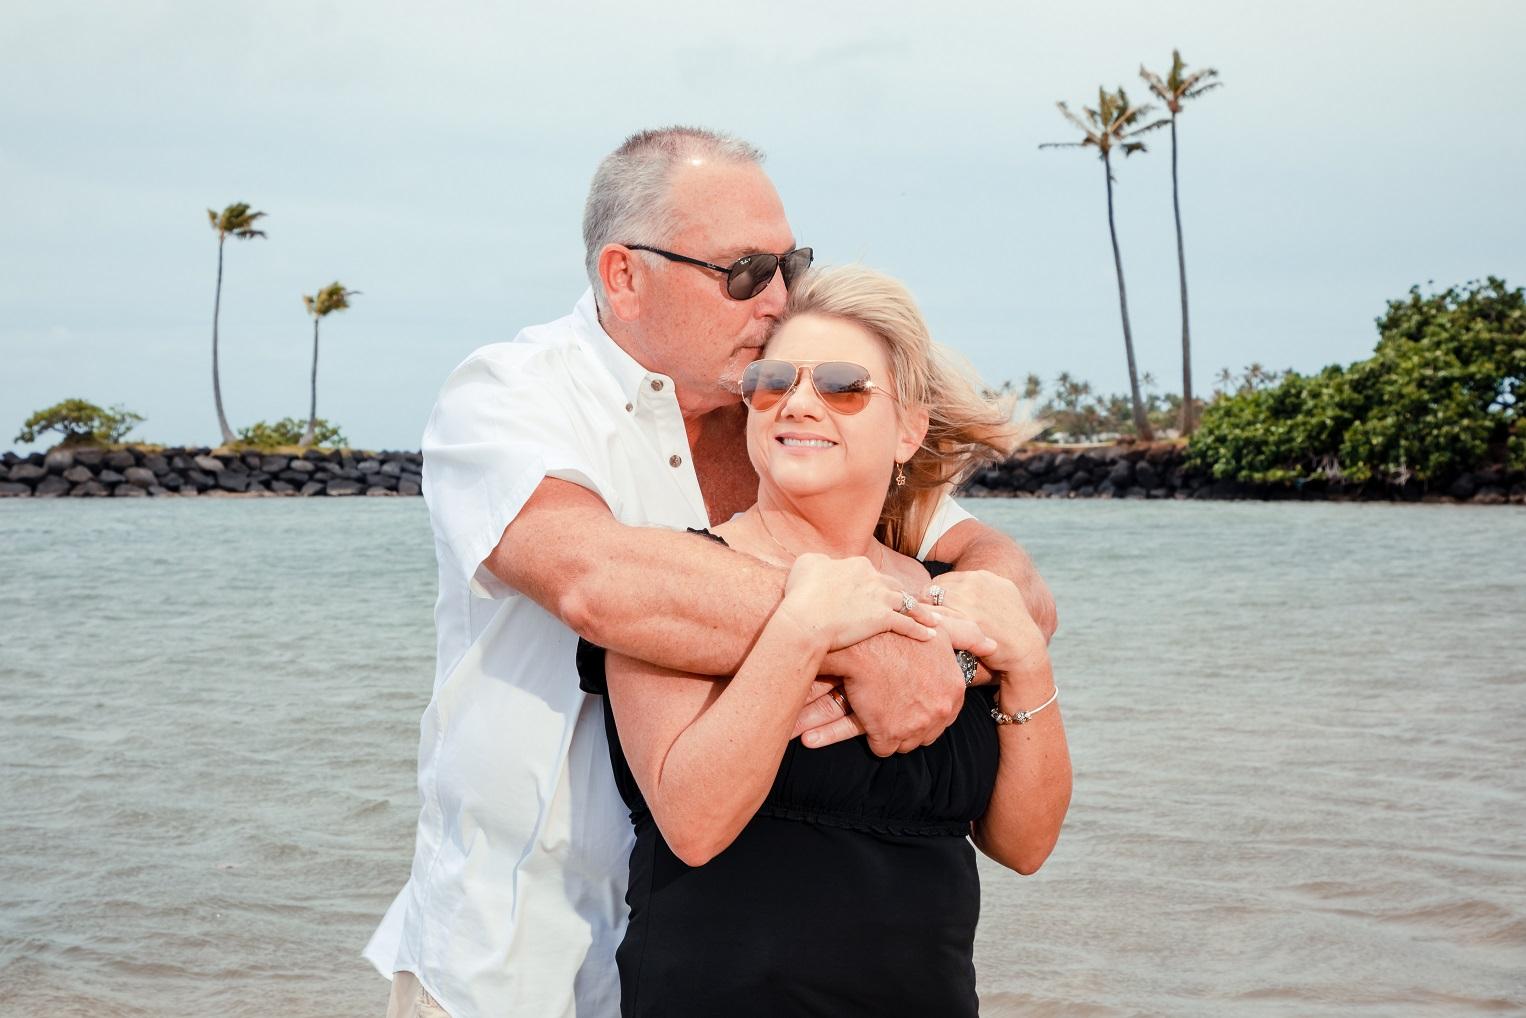 couples anniversary portrait oahu beach